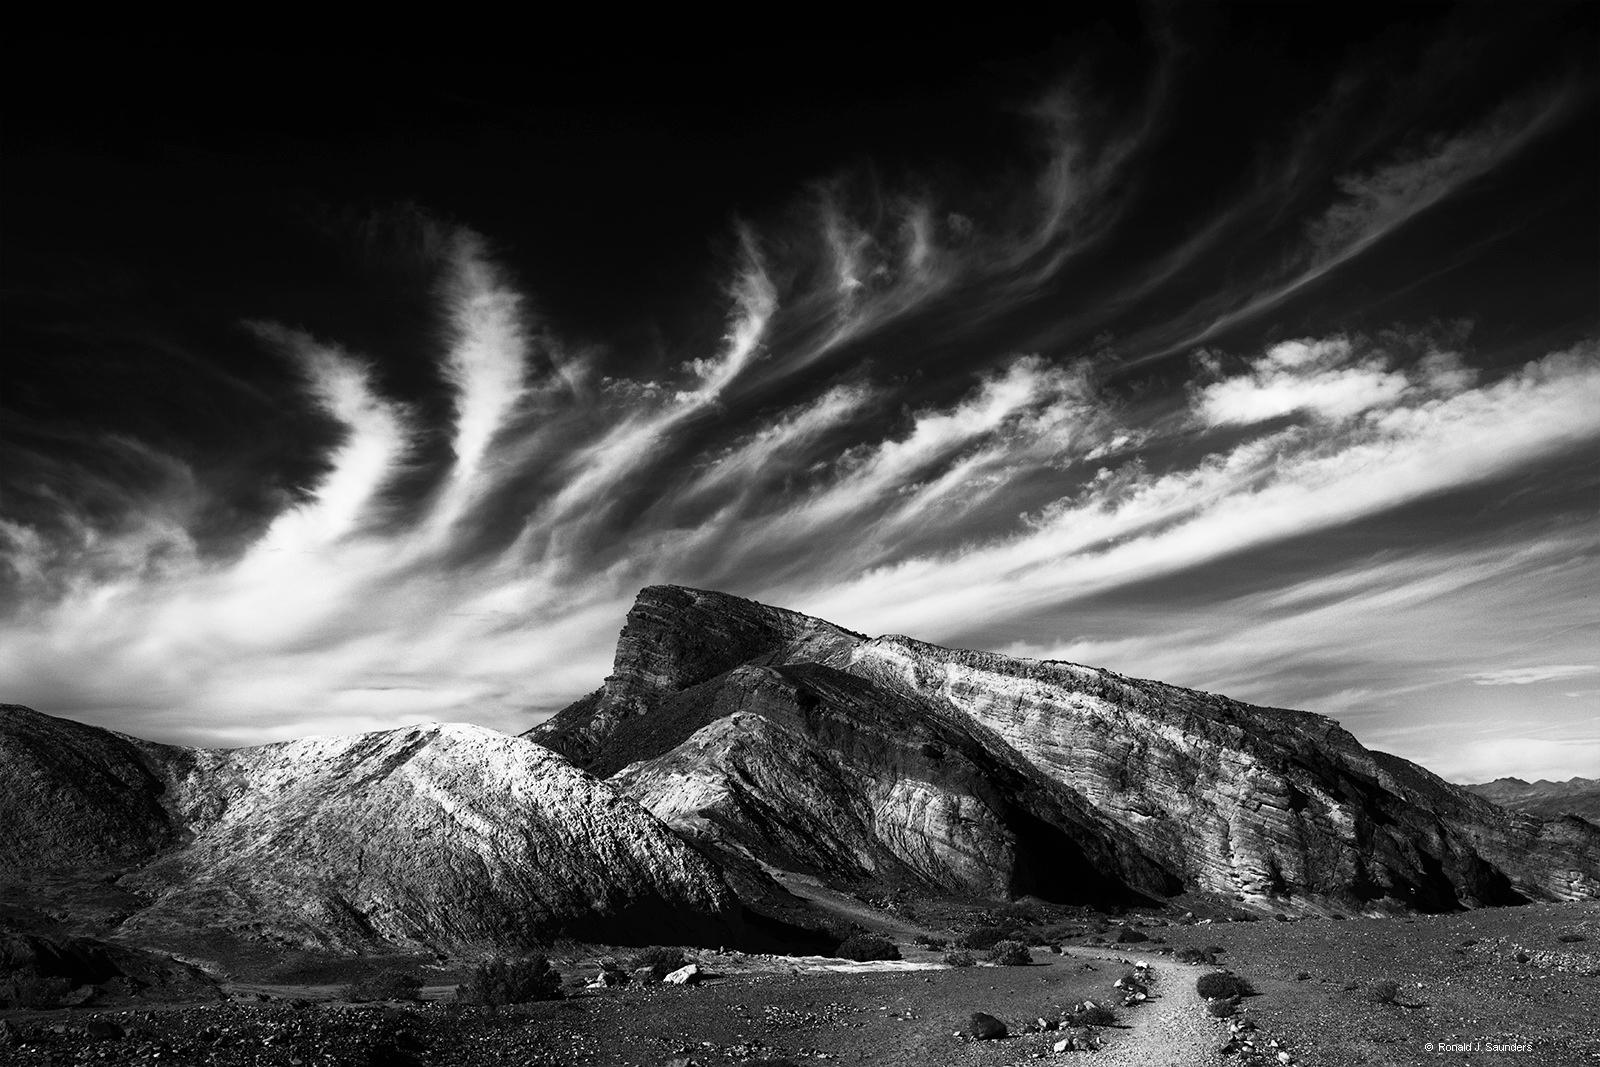 death vally, california, Zabriskie Point, ronald, saunders, ronald j. saunders, landscape, desert, national, park, cloud, black and white, ansel adams, photo